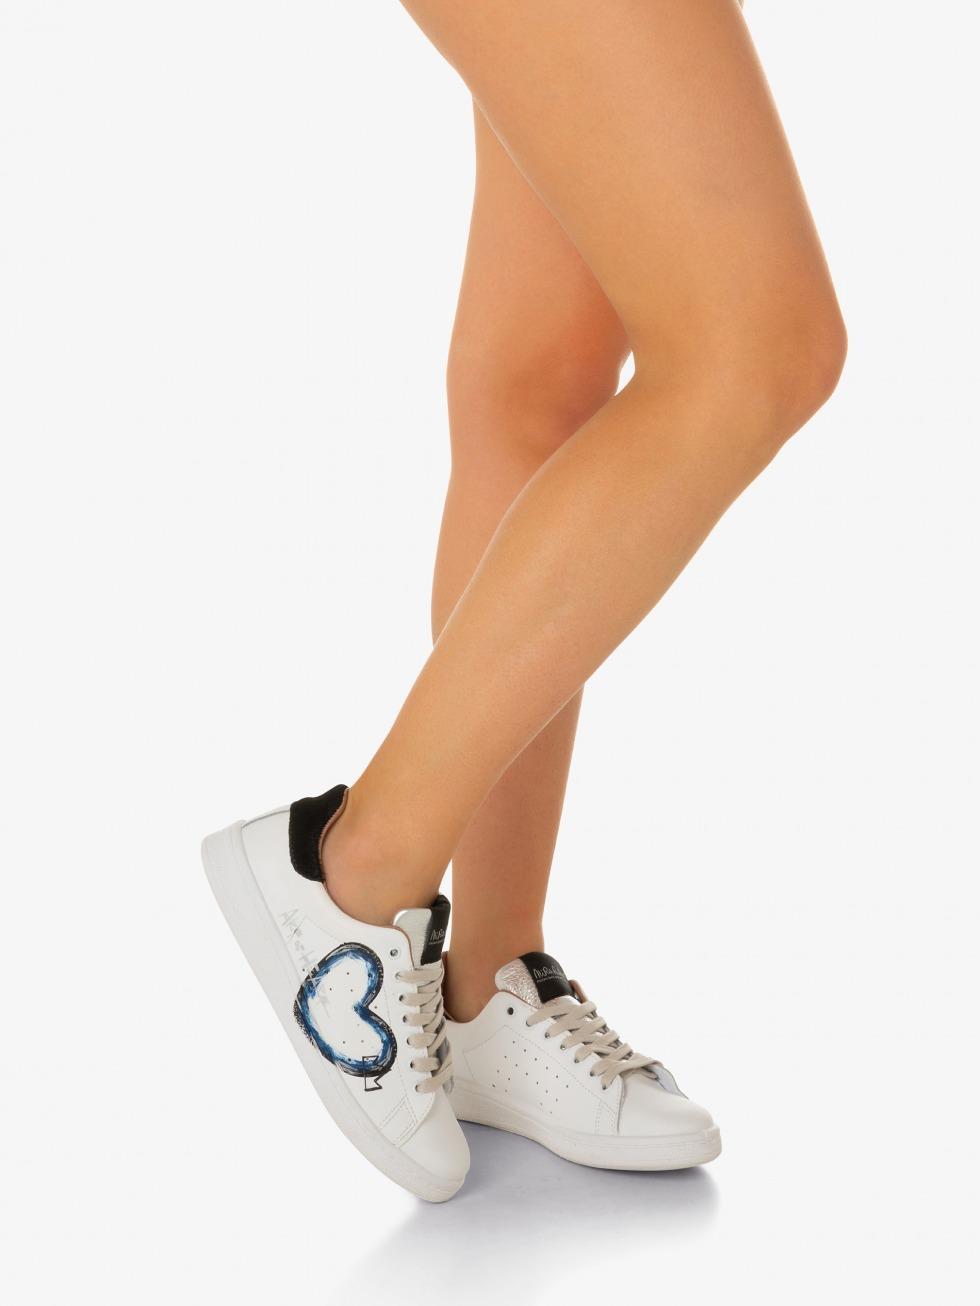 Daiquiri Sneakers - Black Art of Heart Blue